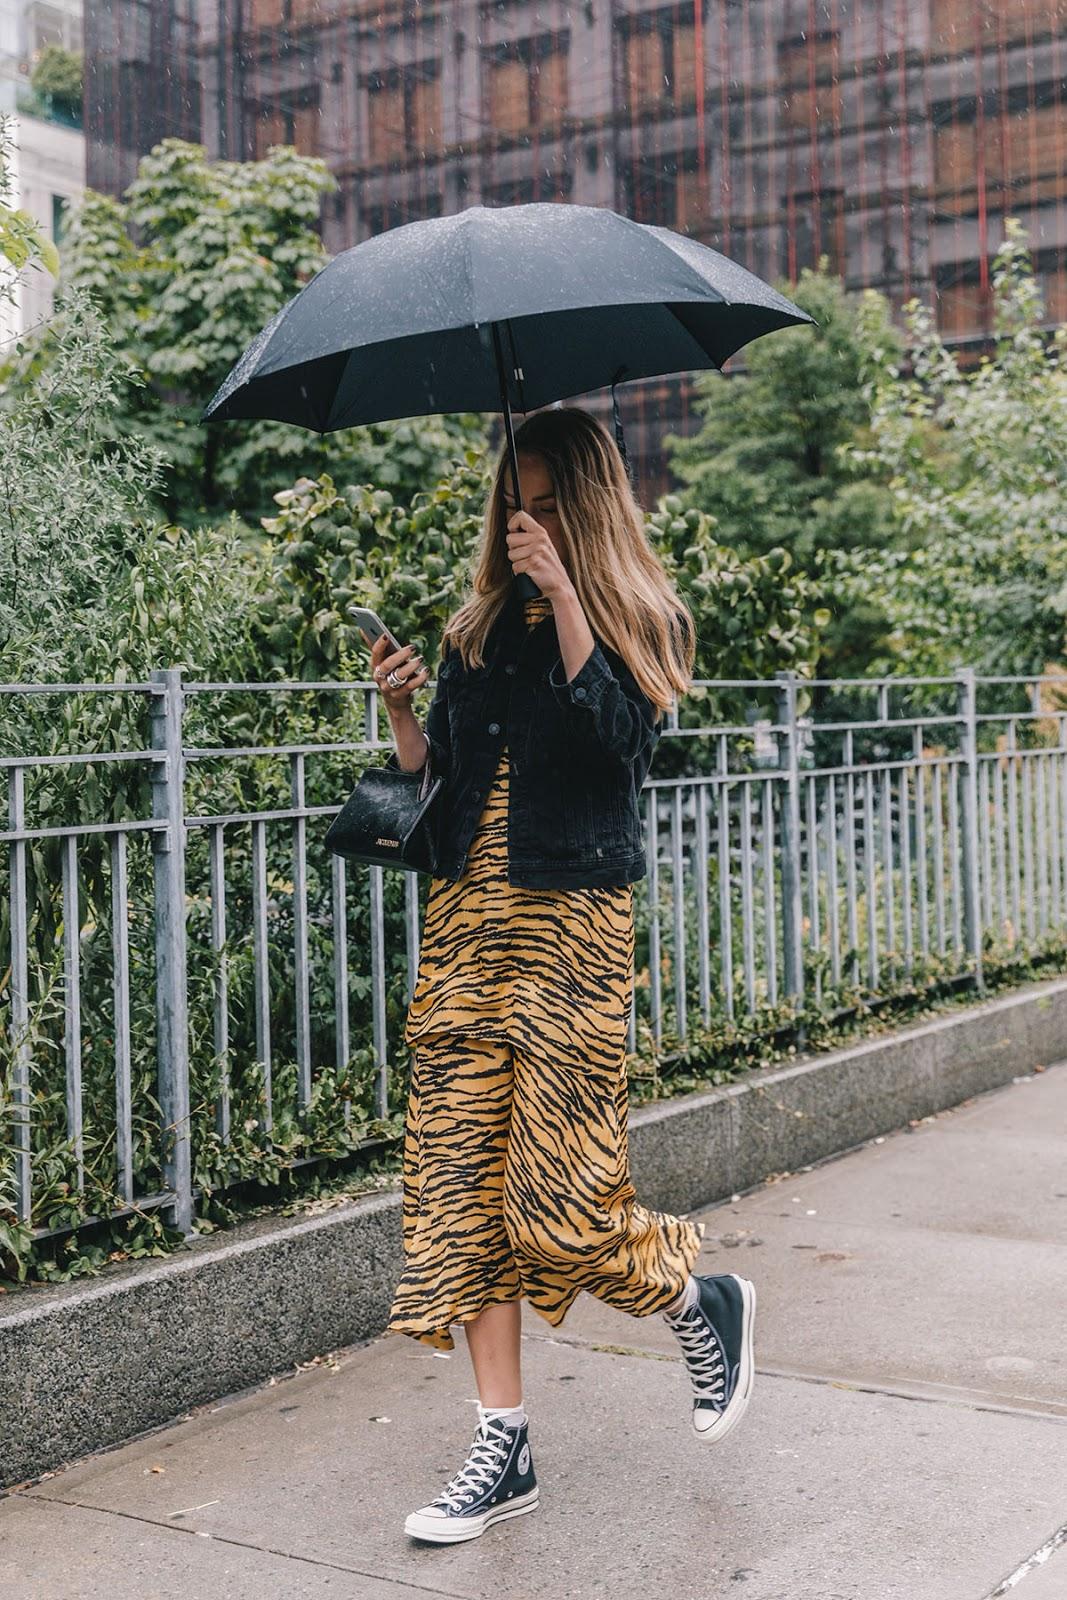 Stylish Rainy Day Outfit Idea: Black Denim Jacket, Black Mini Bag, Animal-Print Dress, and Black Hi-Top Converse Sneakers